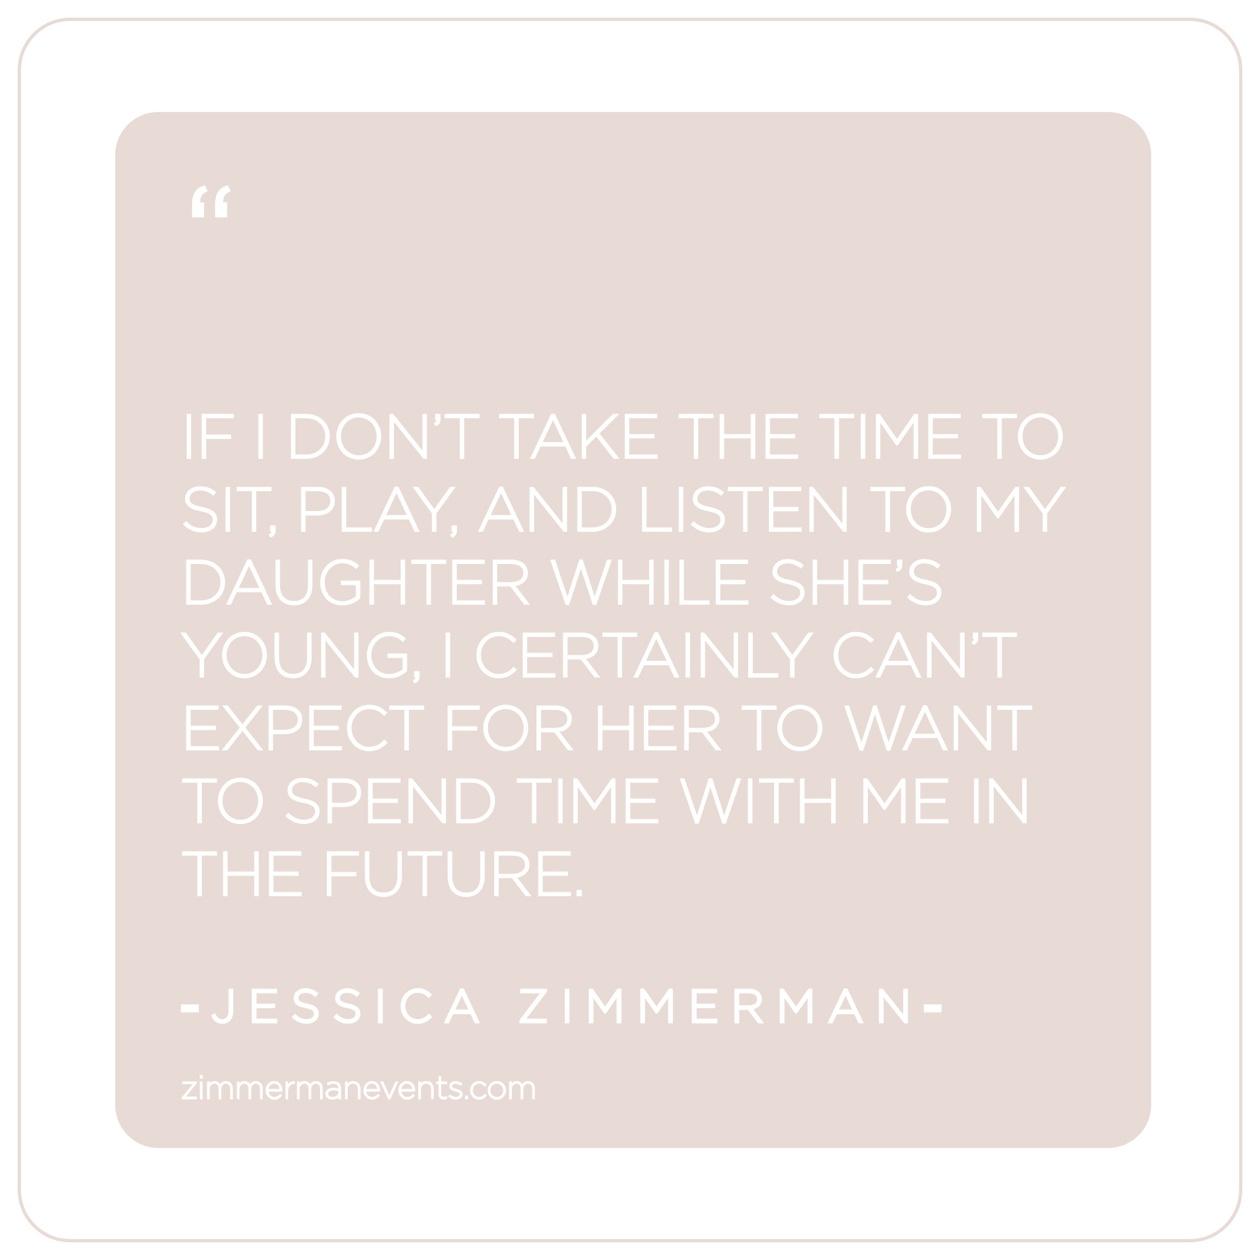 jessica-zimmerman-events-floral-design-coordination-planning-planner-little-rock-conway-arkansas-southern-florist-wedding-home-work-family-balance-business-mentor-mom